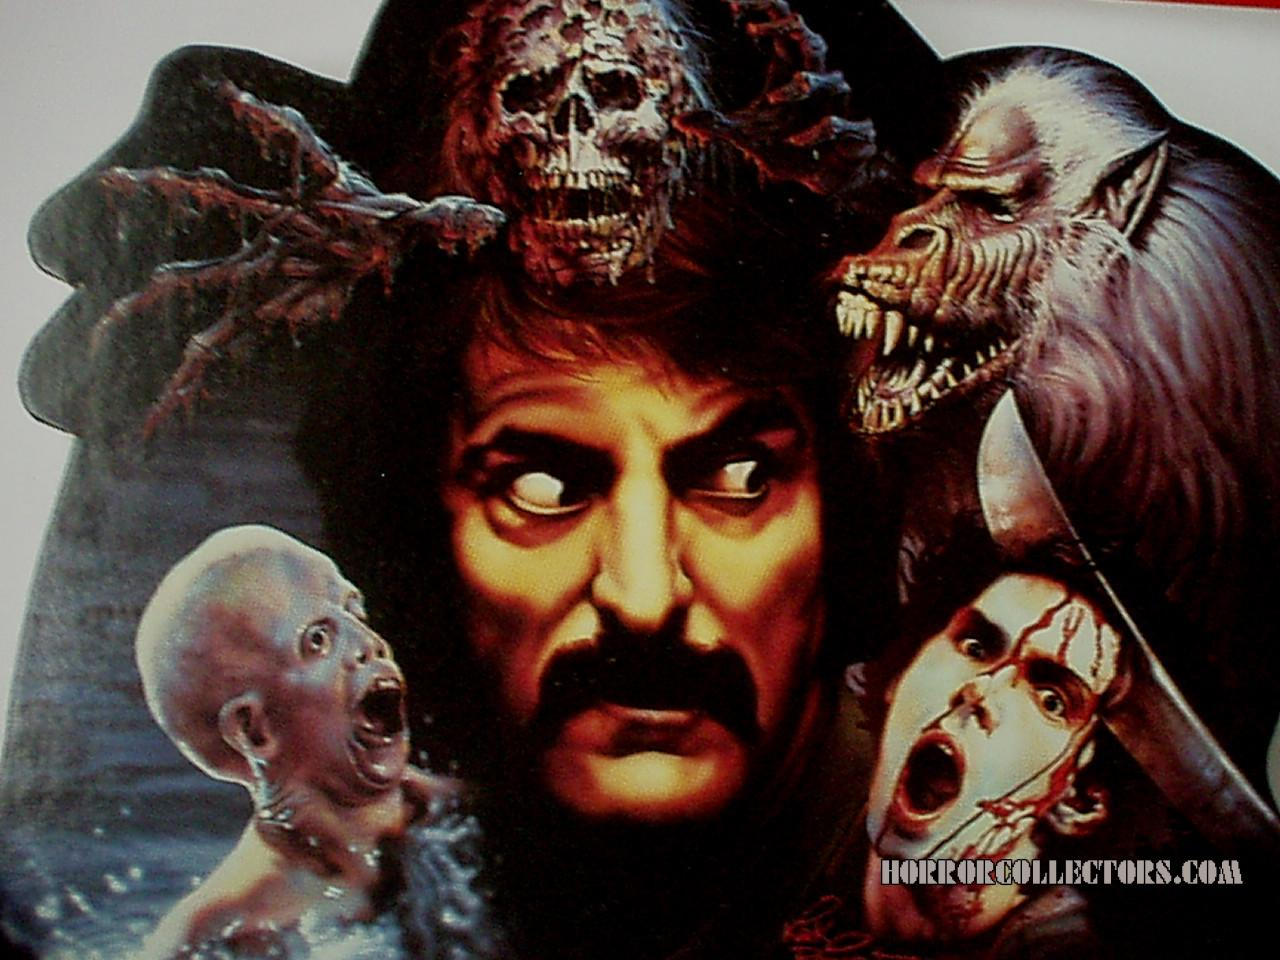 Scream Greats Tom Savini Video Store Promo